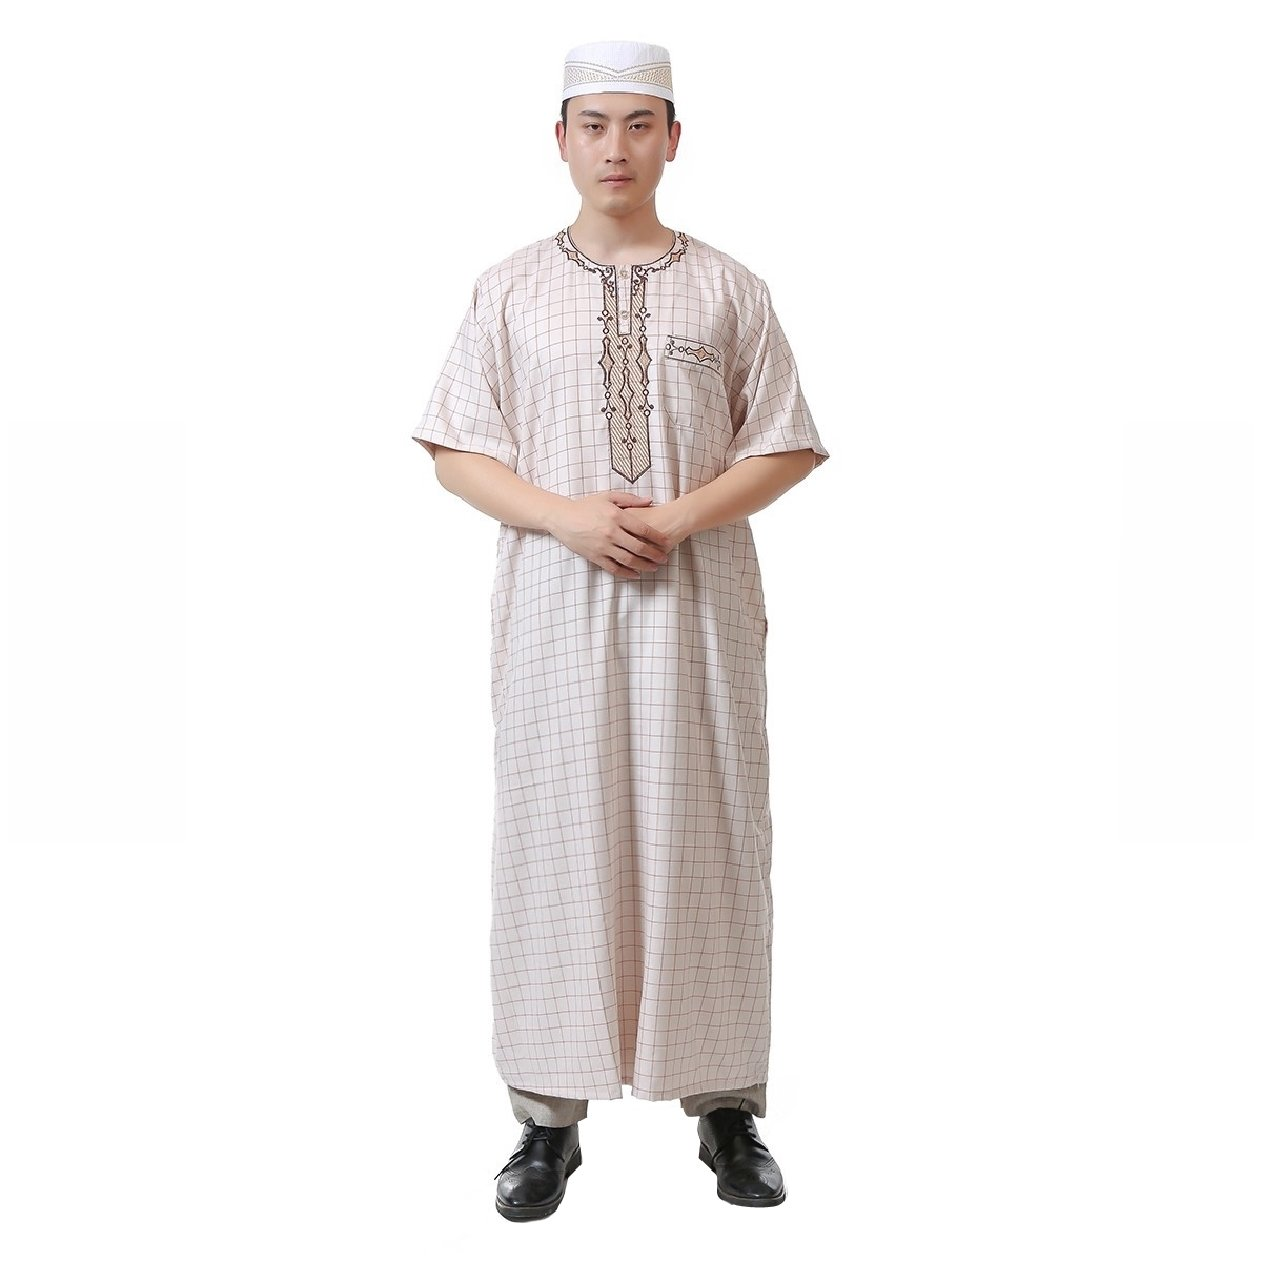 Zimaes Men Short-Sleeve Crew-Neck Plaid Middle East Arab Muslim Thobe Beige 60